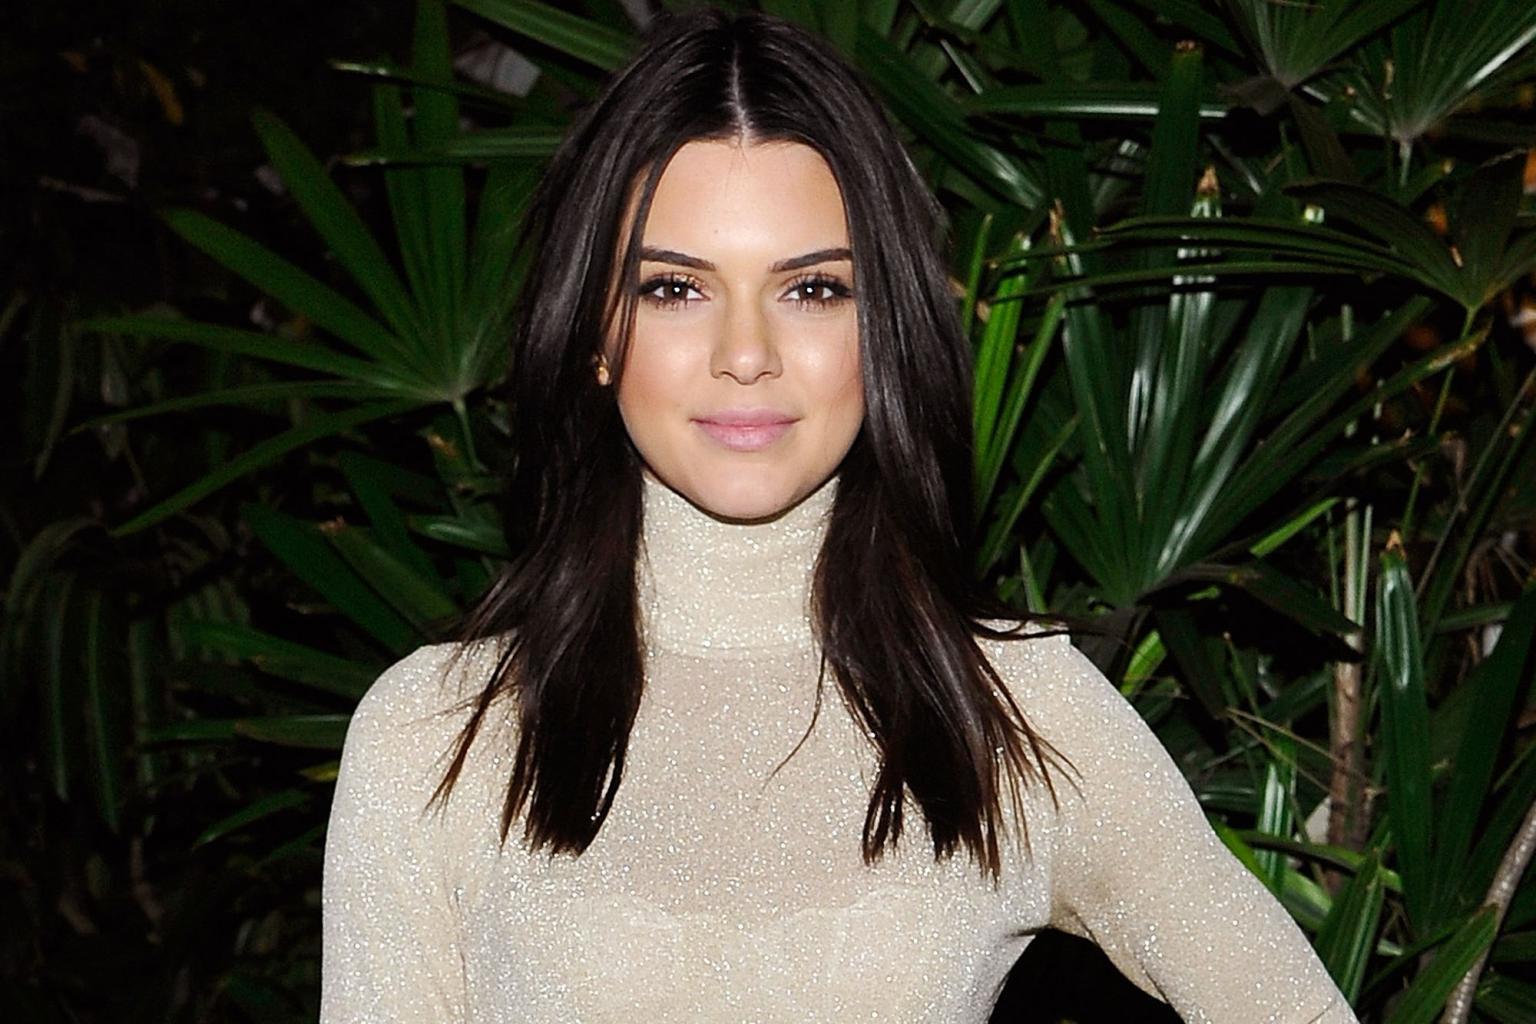 Peek-a-bum! Kendall Jenner Flashes Her Butt in See-through Skirt at Coachella